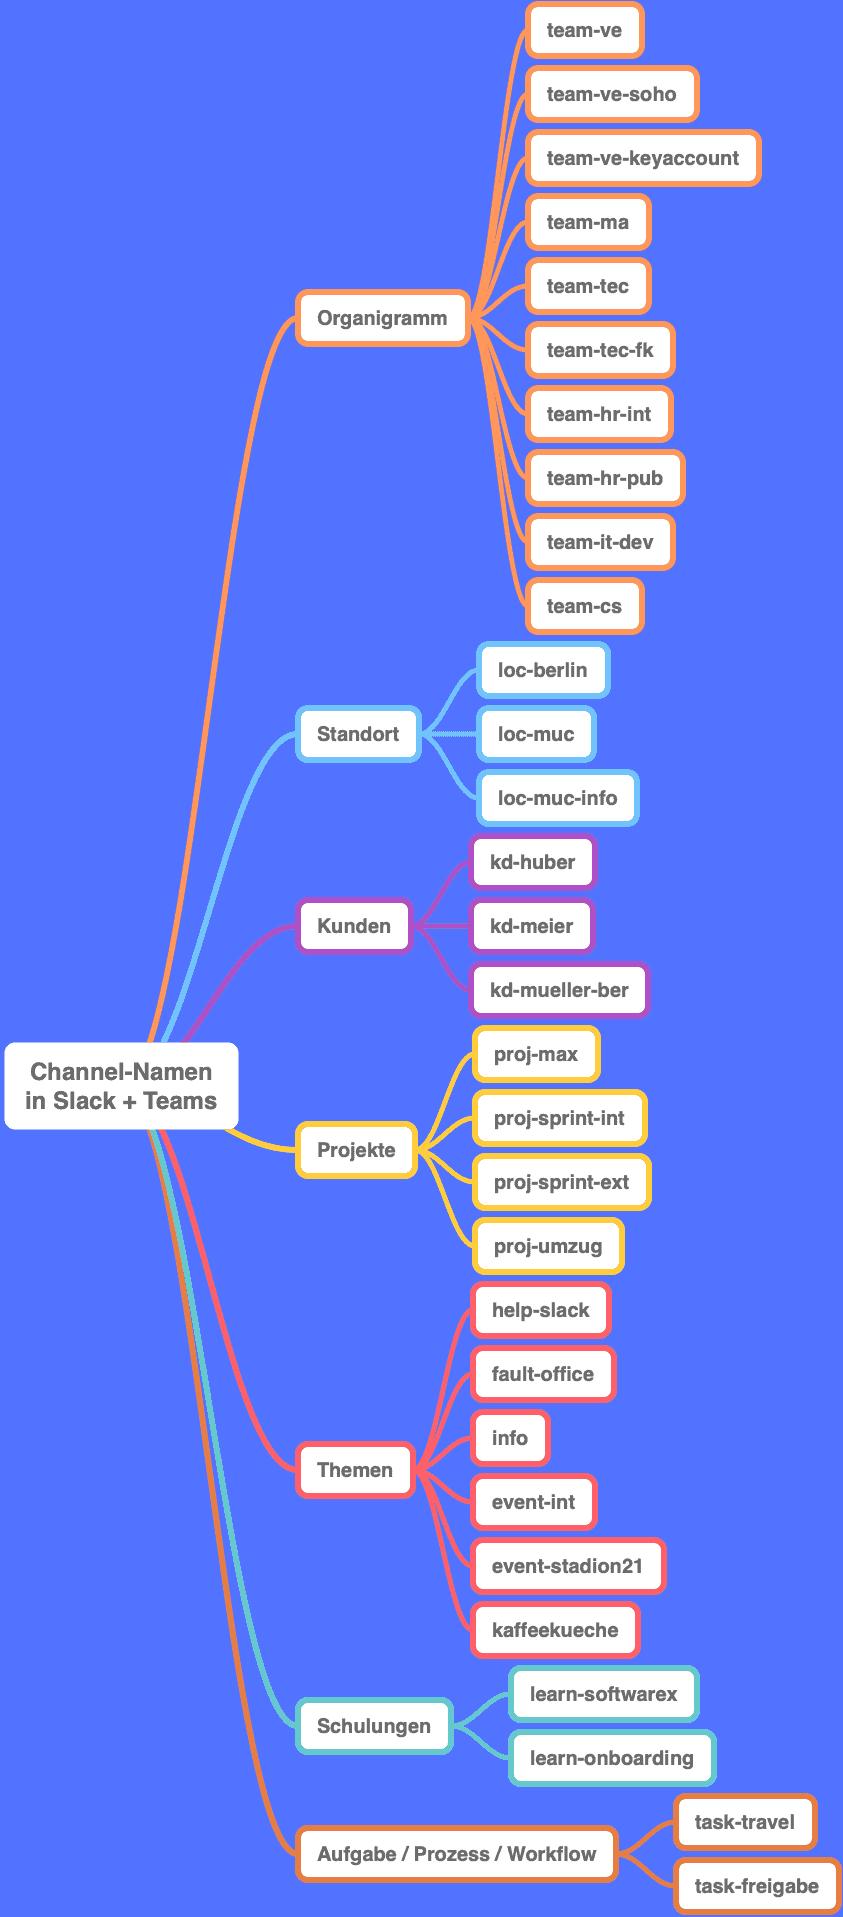 Channel-Namen in Slack und Microsoft Teams